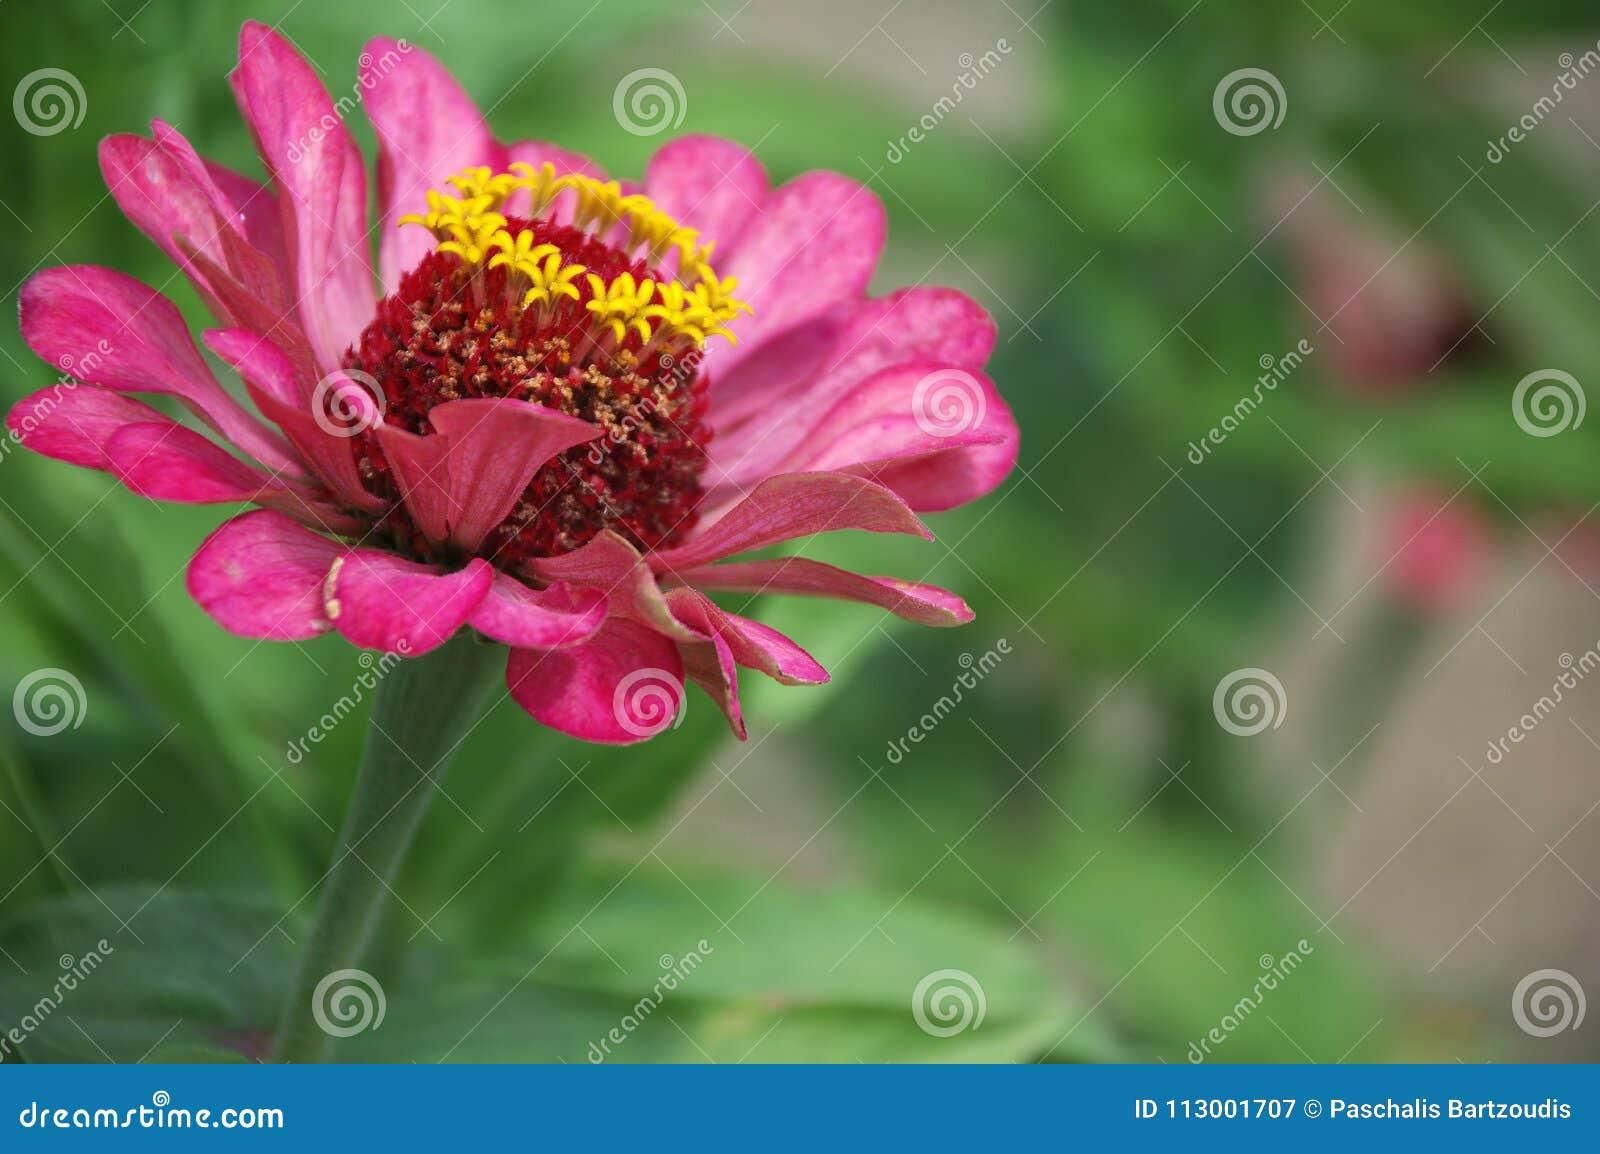 Increíble Flor De Lirio Arte De Uñas Cresta - Ideas Para Pintar Uñas ...